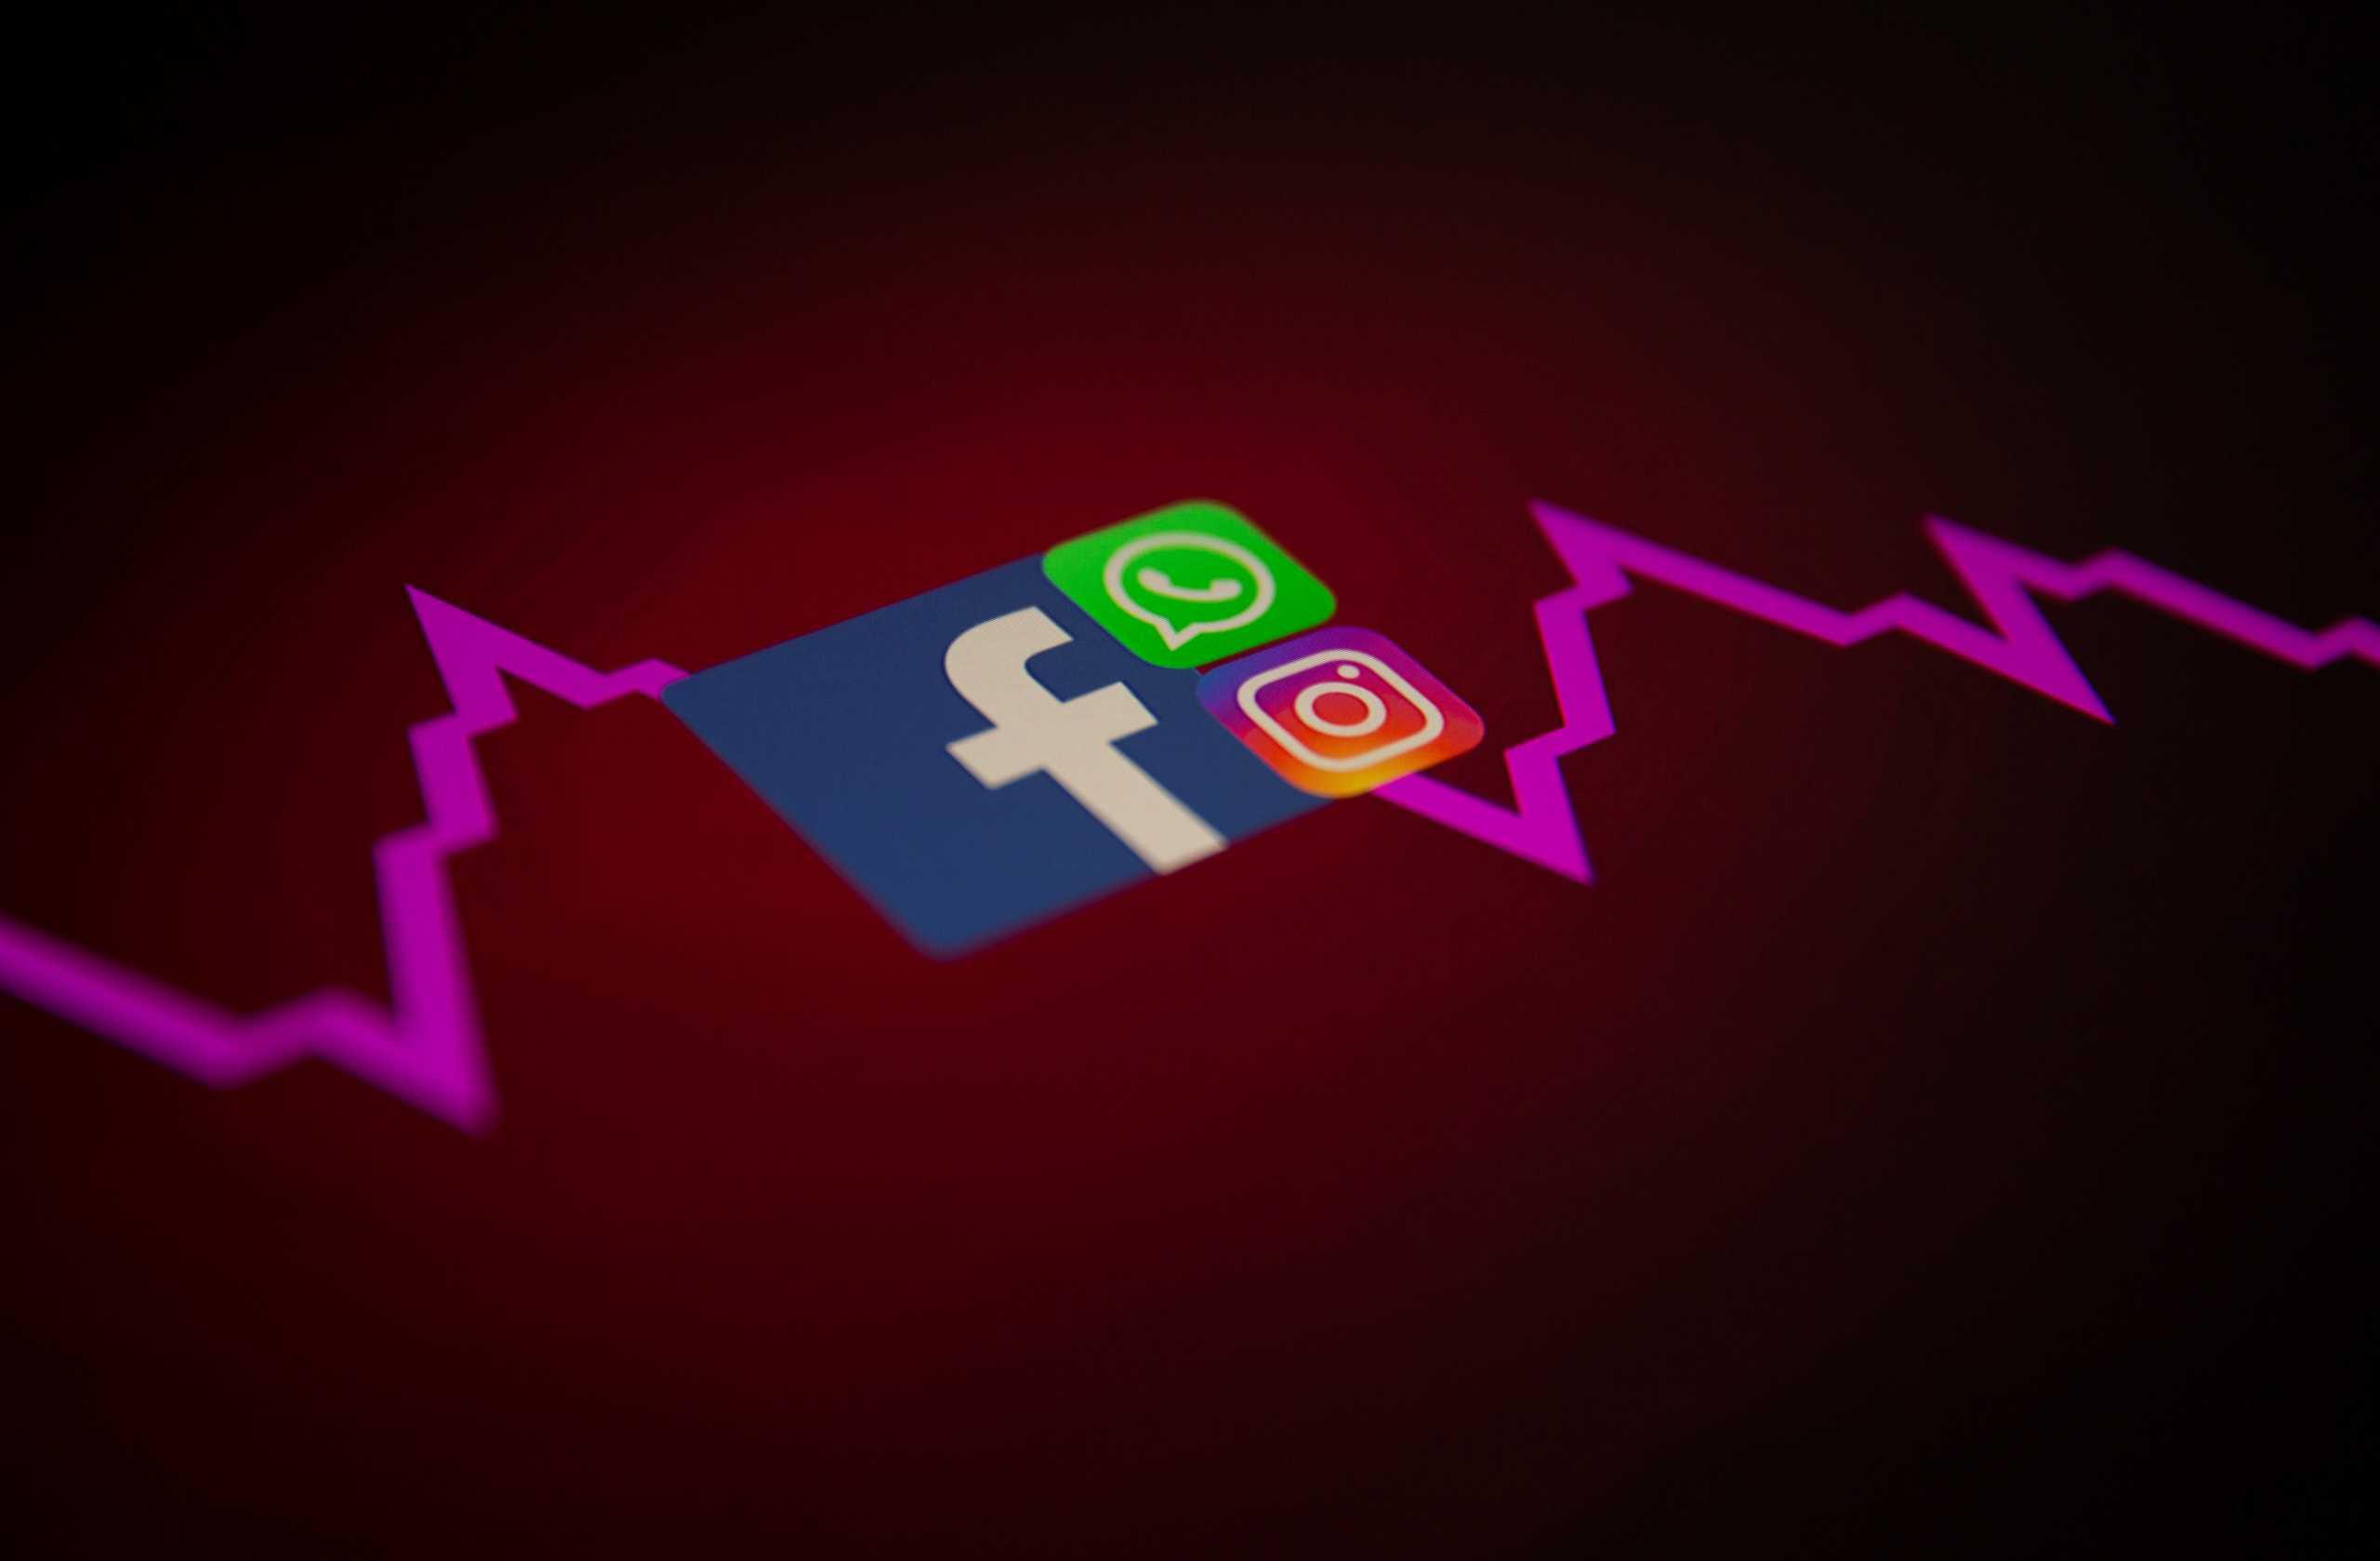 Facebook: Η πτώση δεν οφείλεται σε χακάρισμα